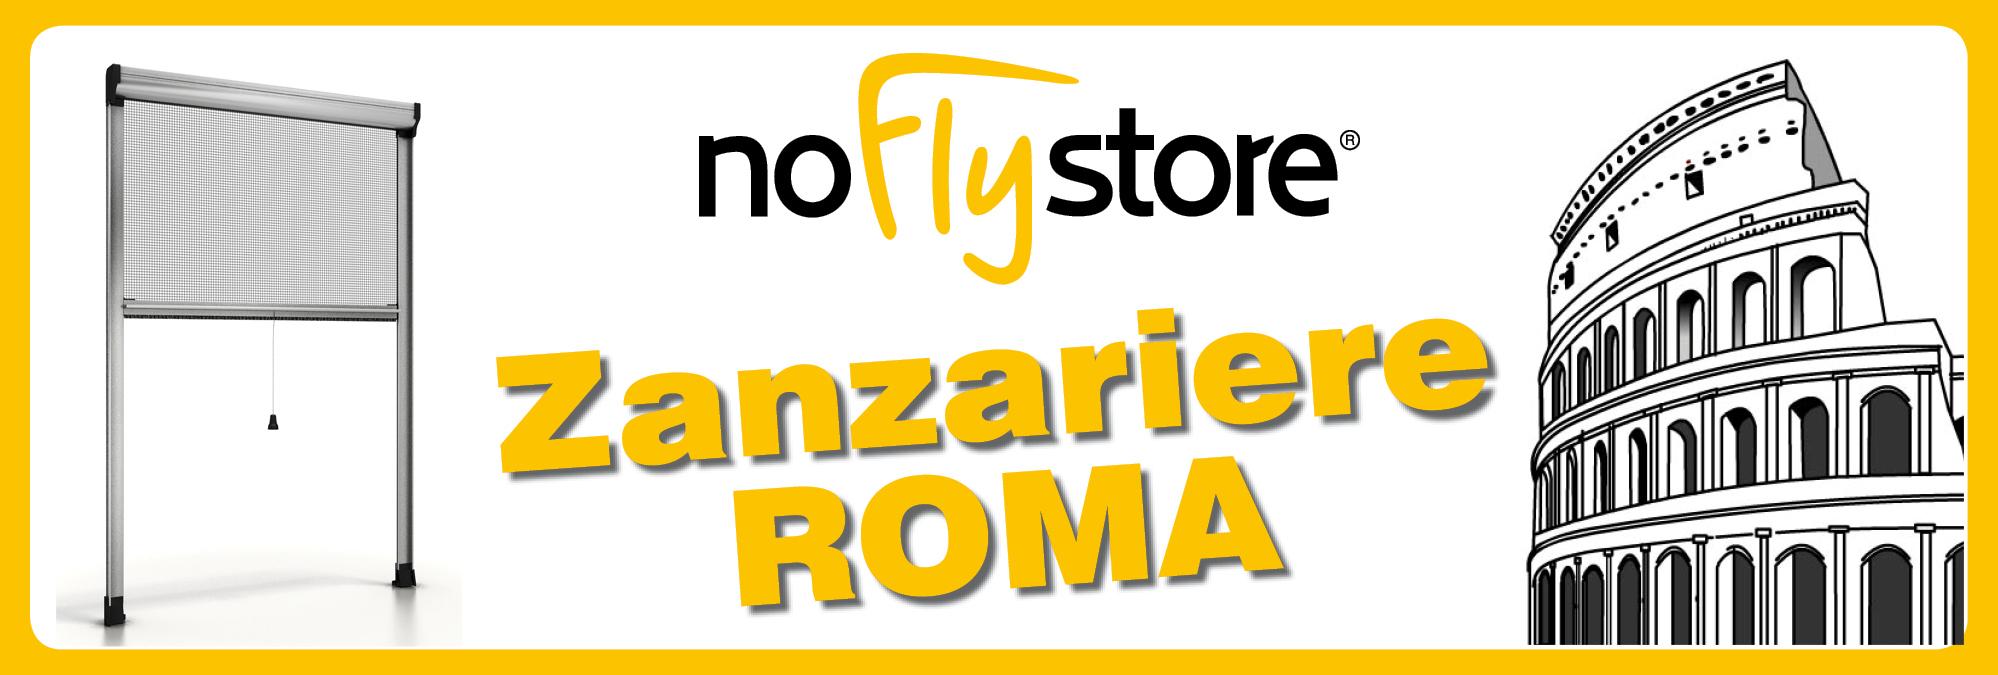 Zanzariere a Roma - Offerte NoFlyStore